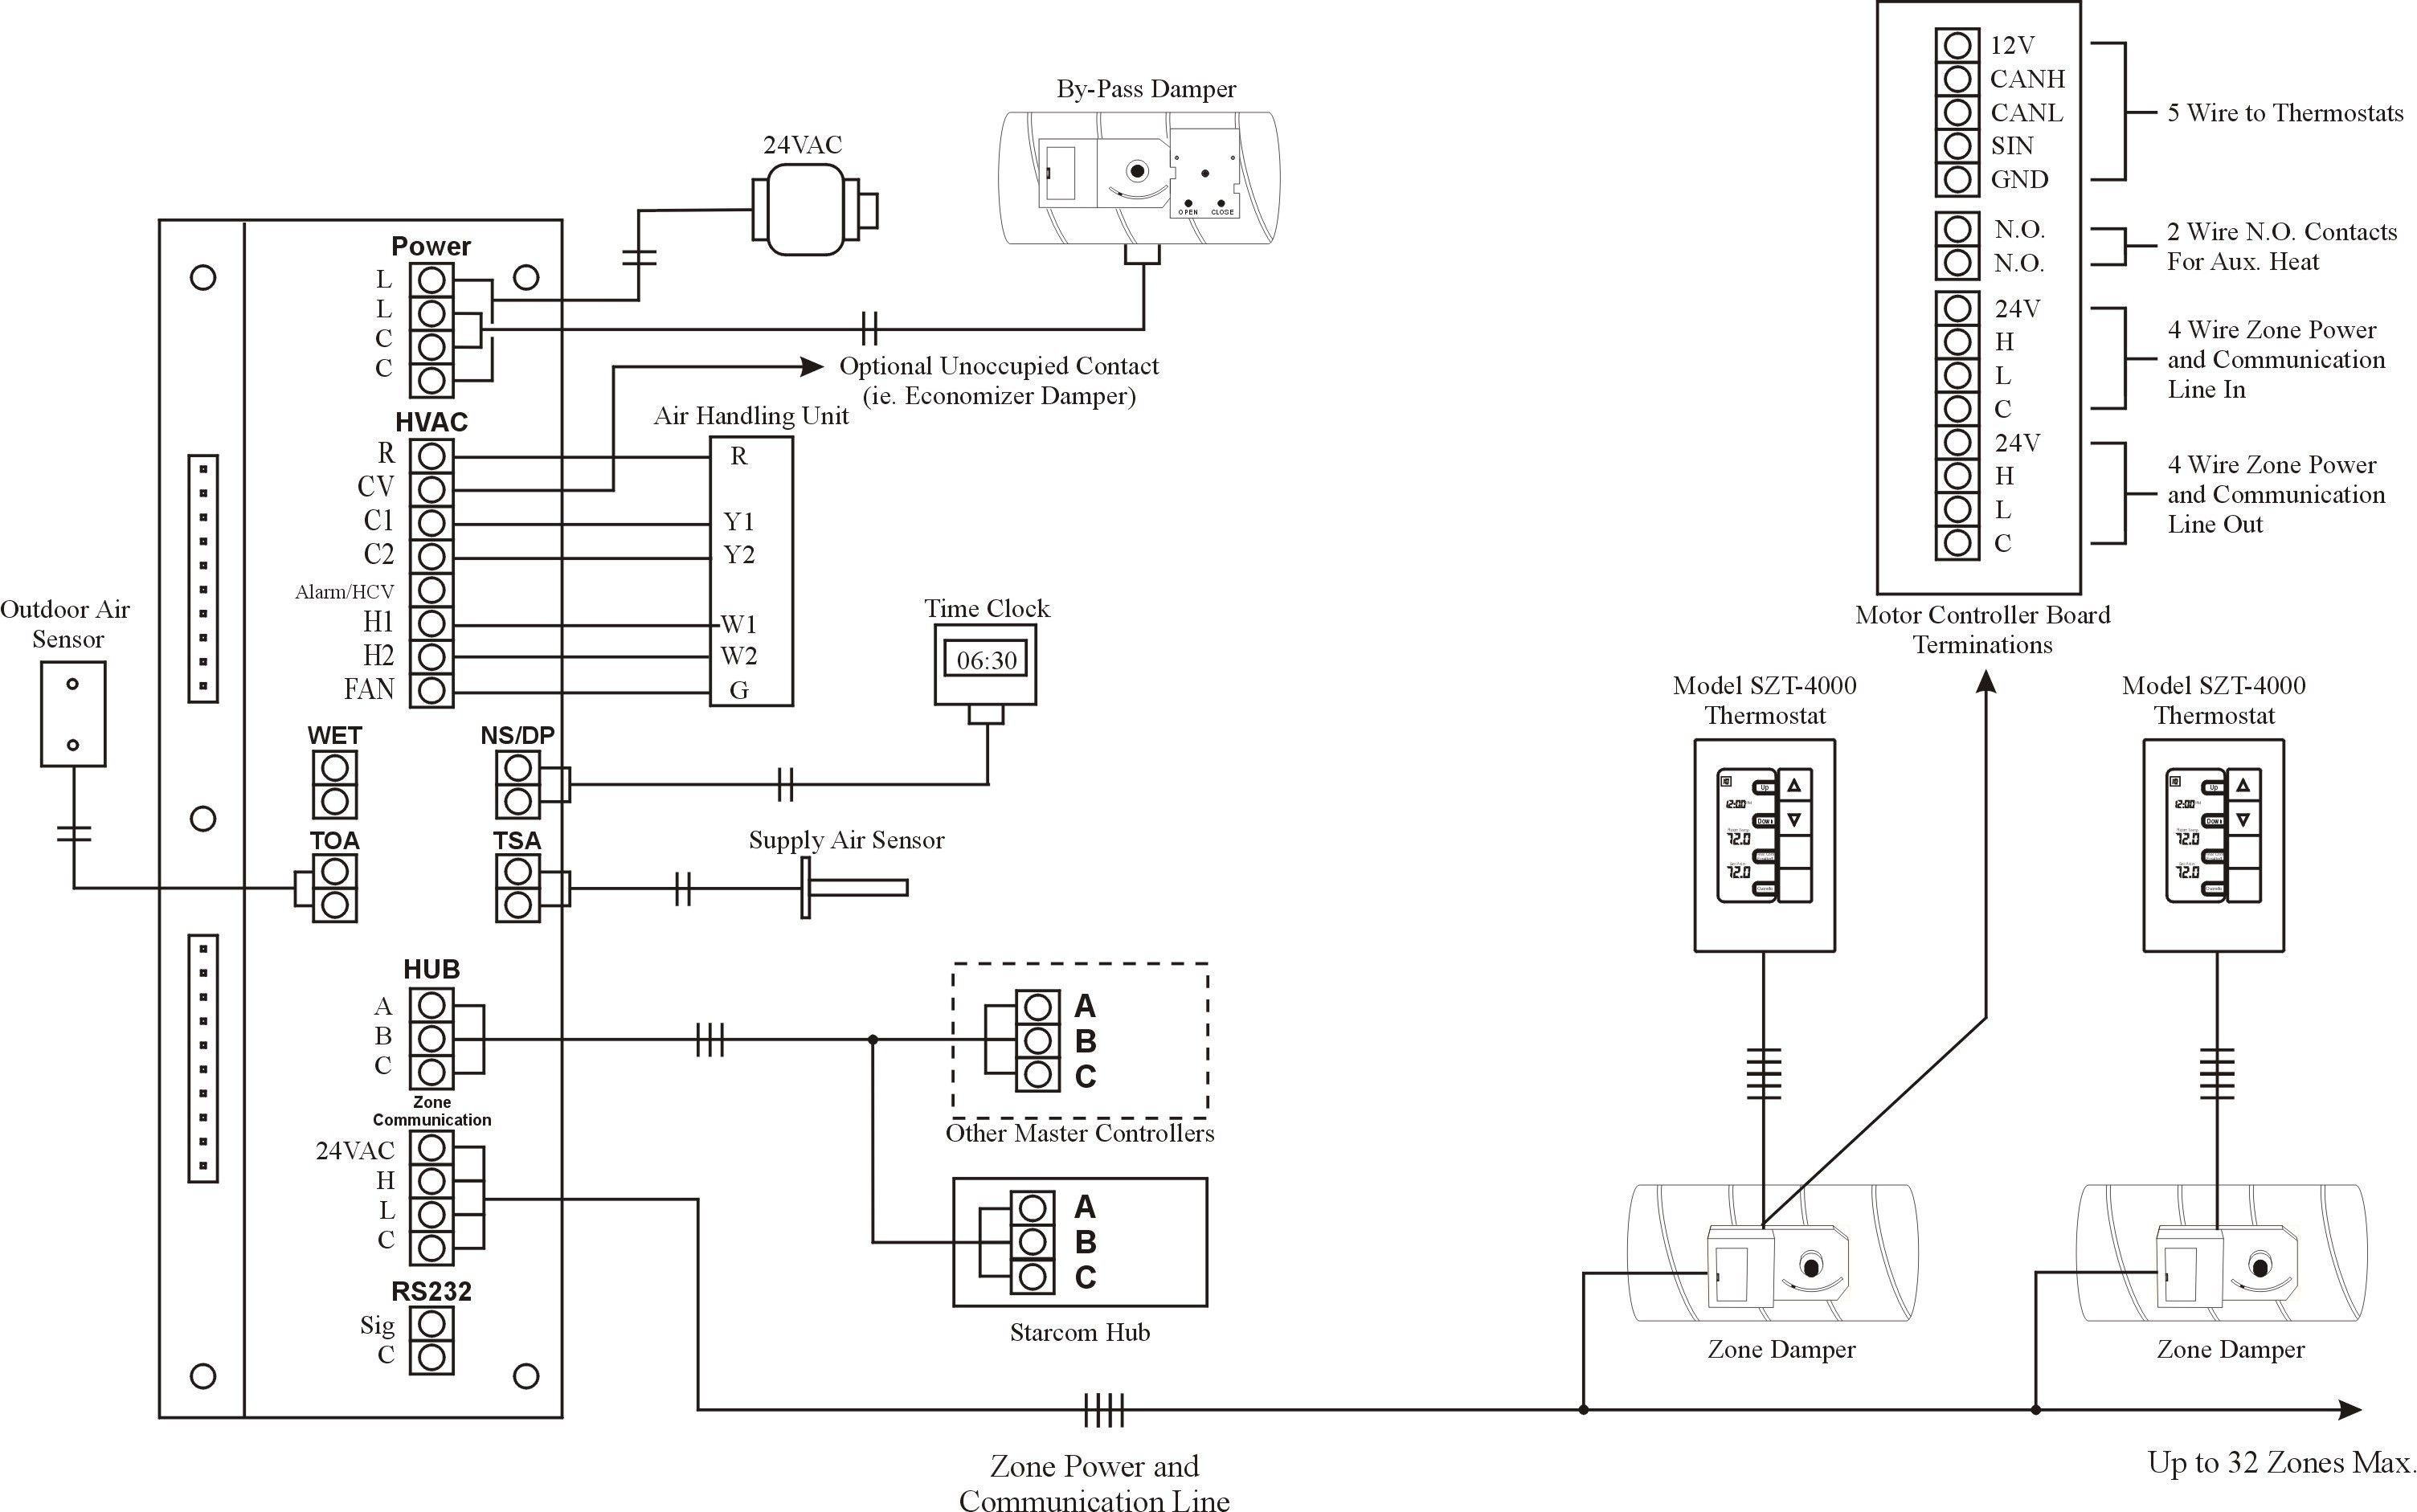 diagram] audi a4 wiring diagram pdf full version hd quality diagram pdf -  carryboyphil.k-danse.fr  k-danse.fr